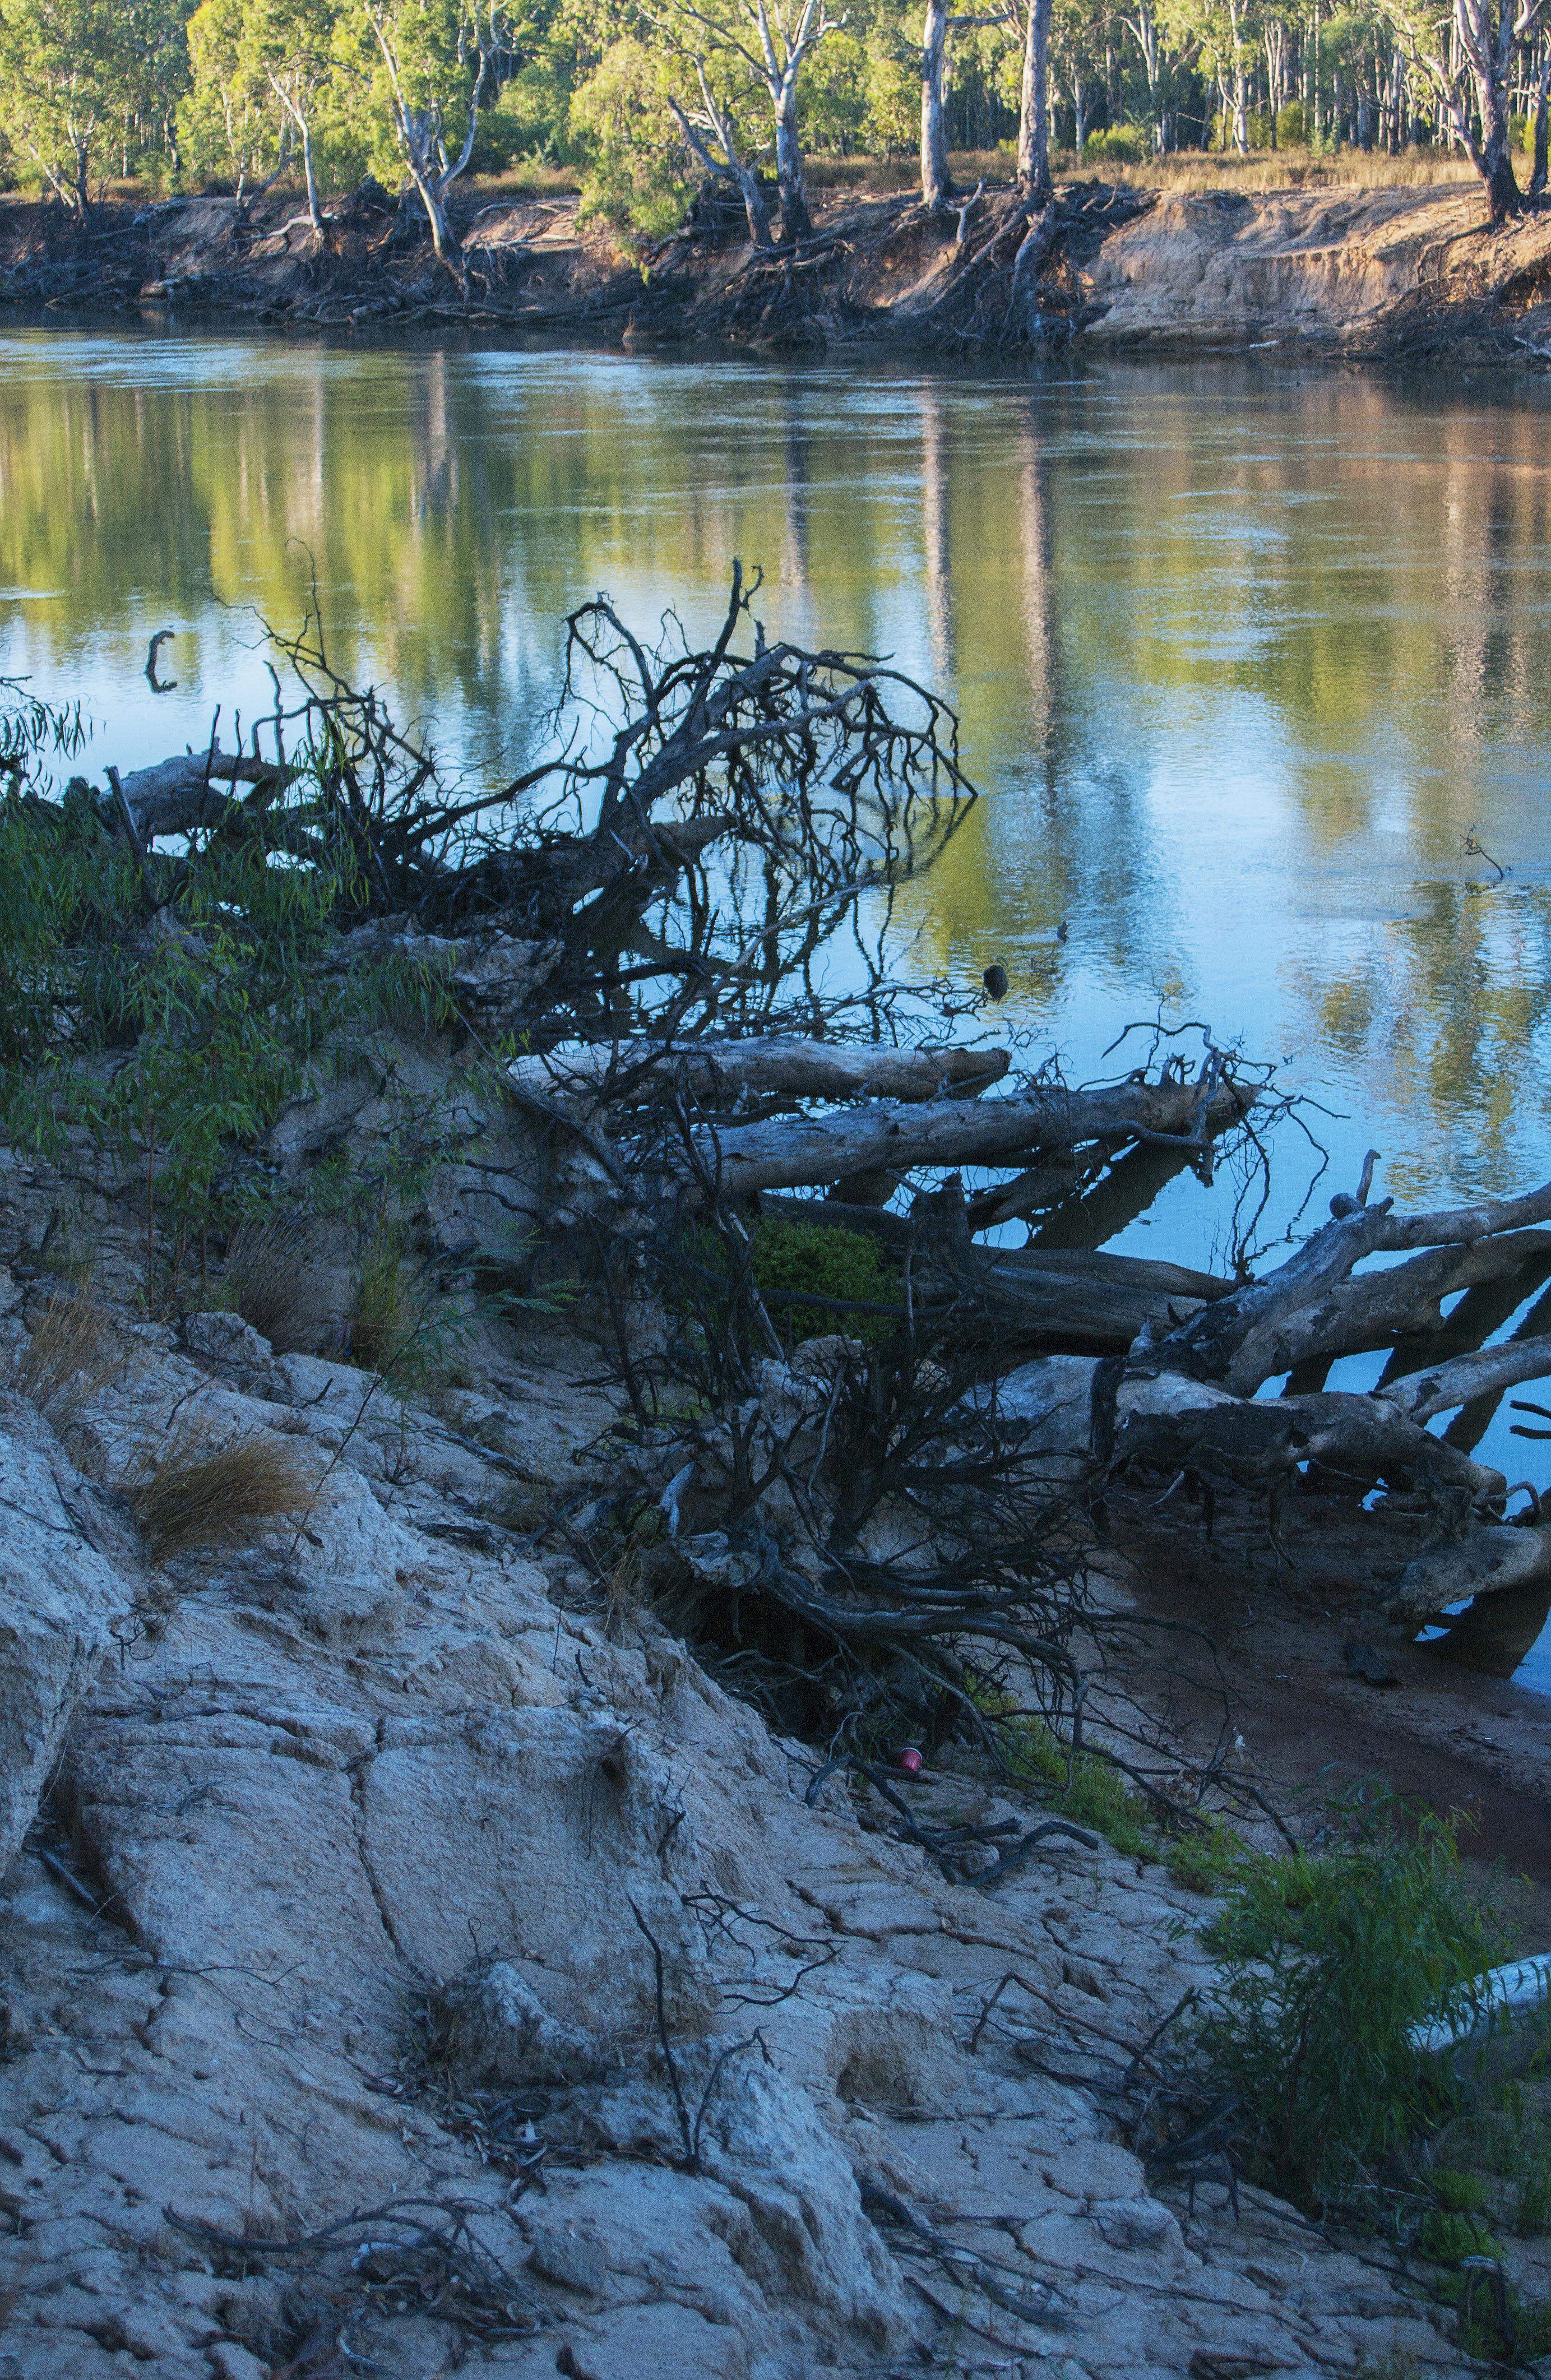 Murray River - Echuca Victoria.